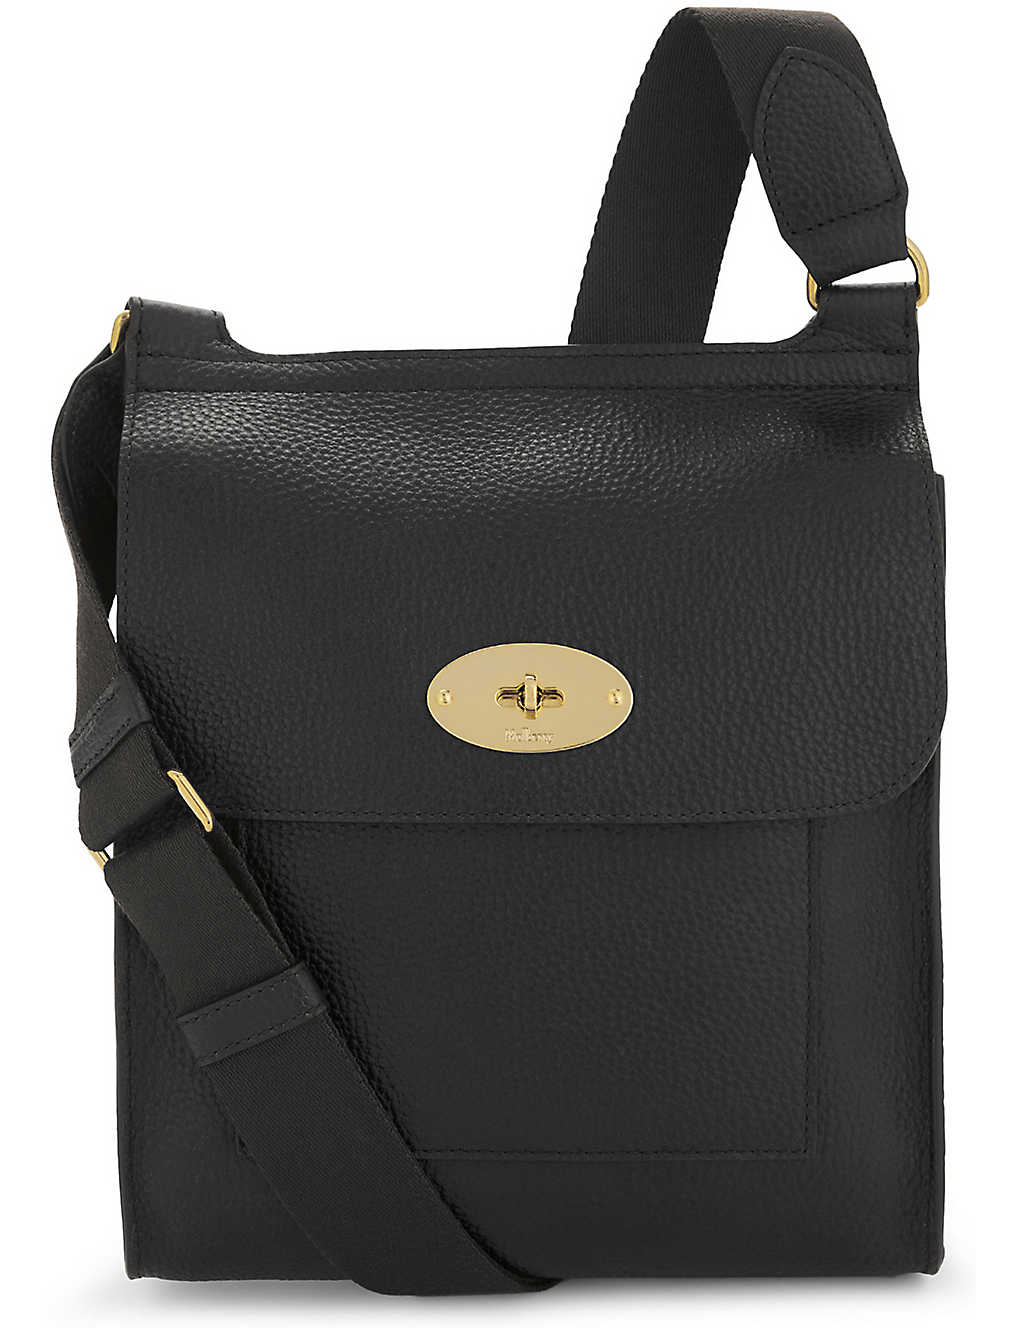 512e6f2f39a MULBERRY - Antony grained leather cross-body bag   Selfridges.com